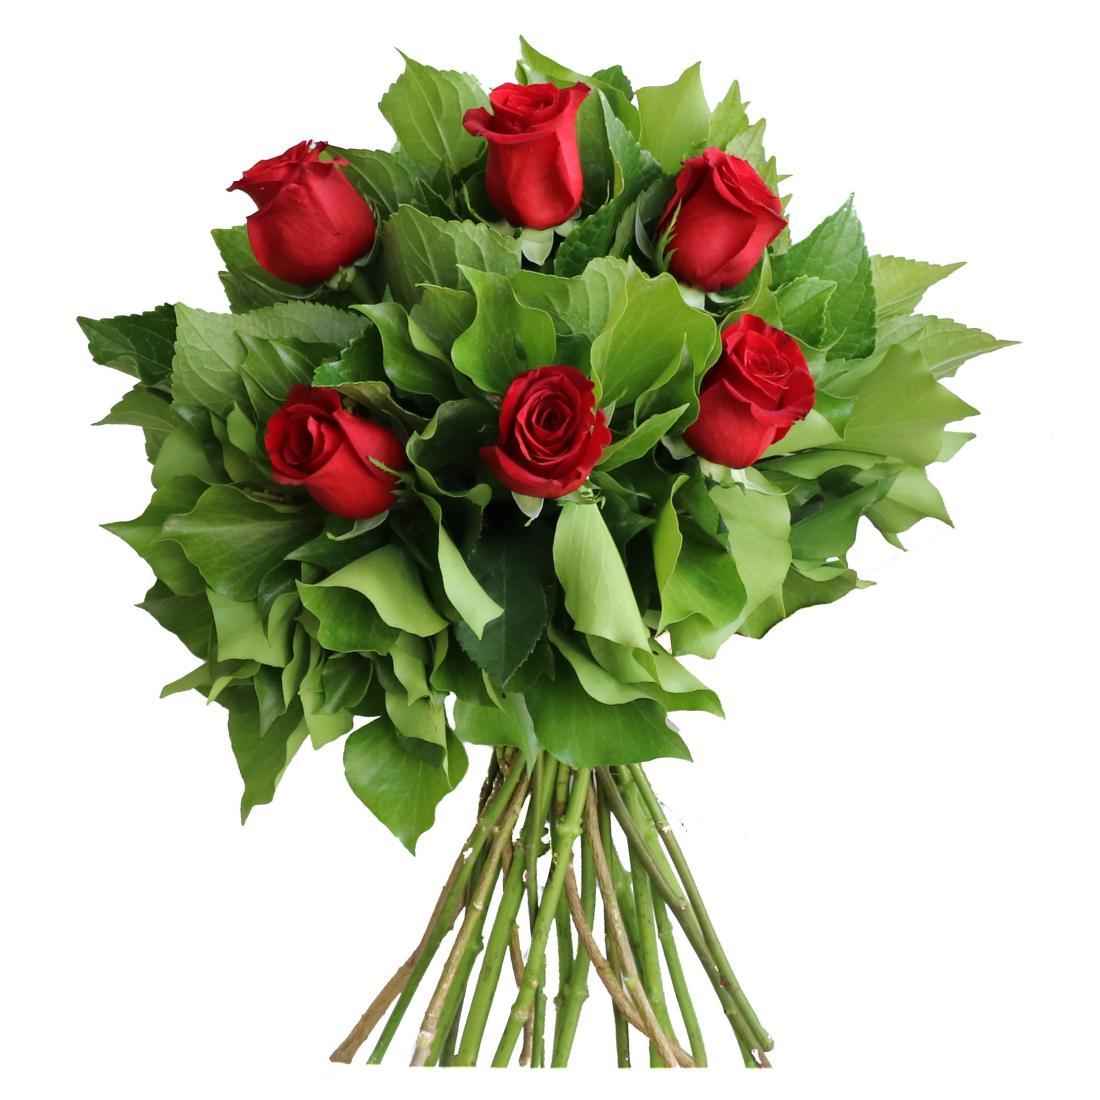 Amira - 6 Roses